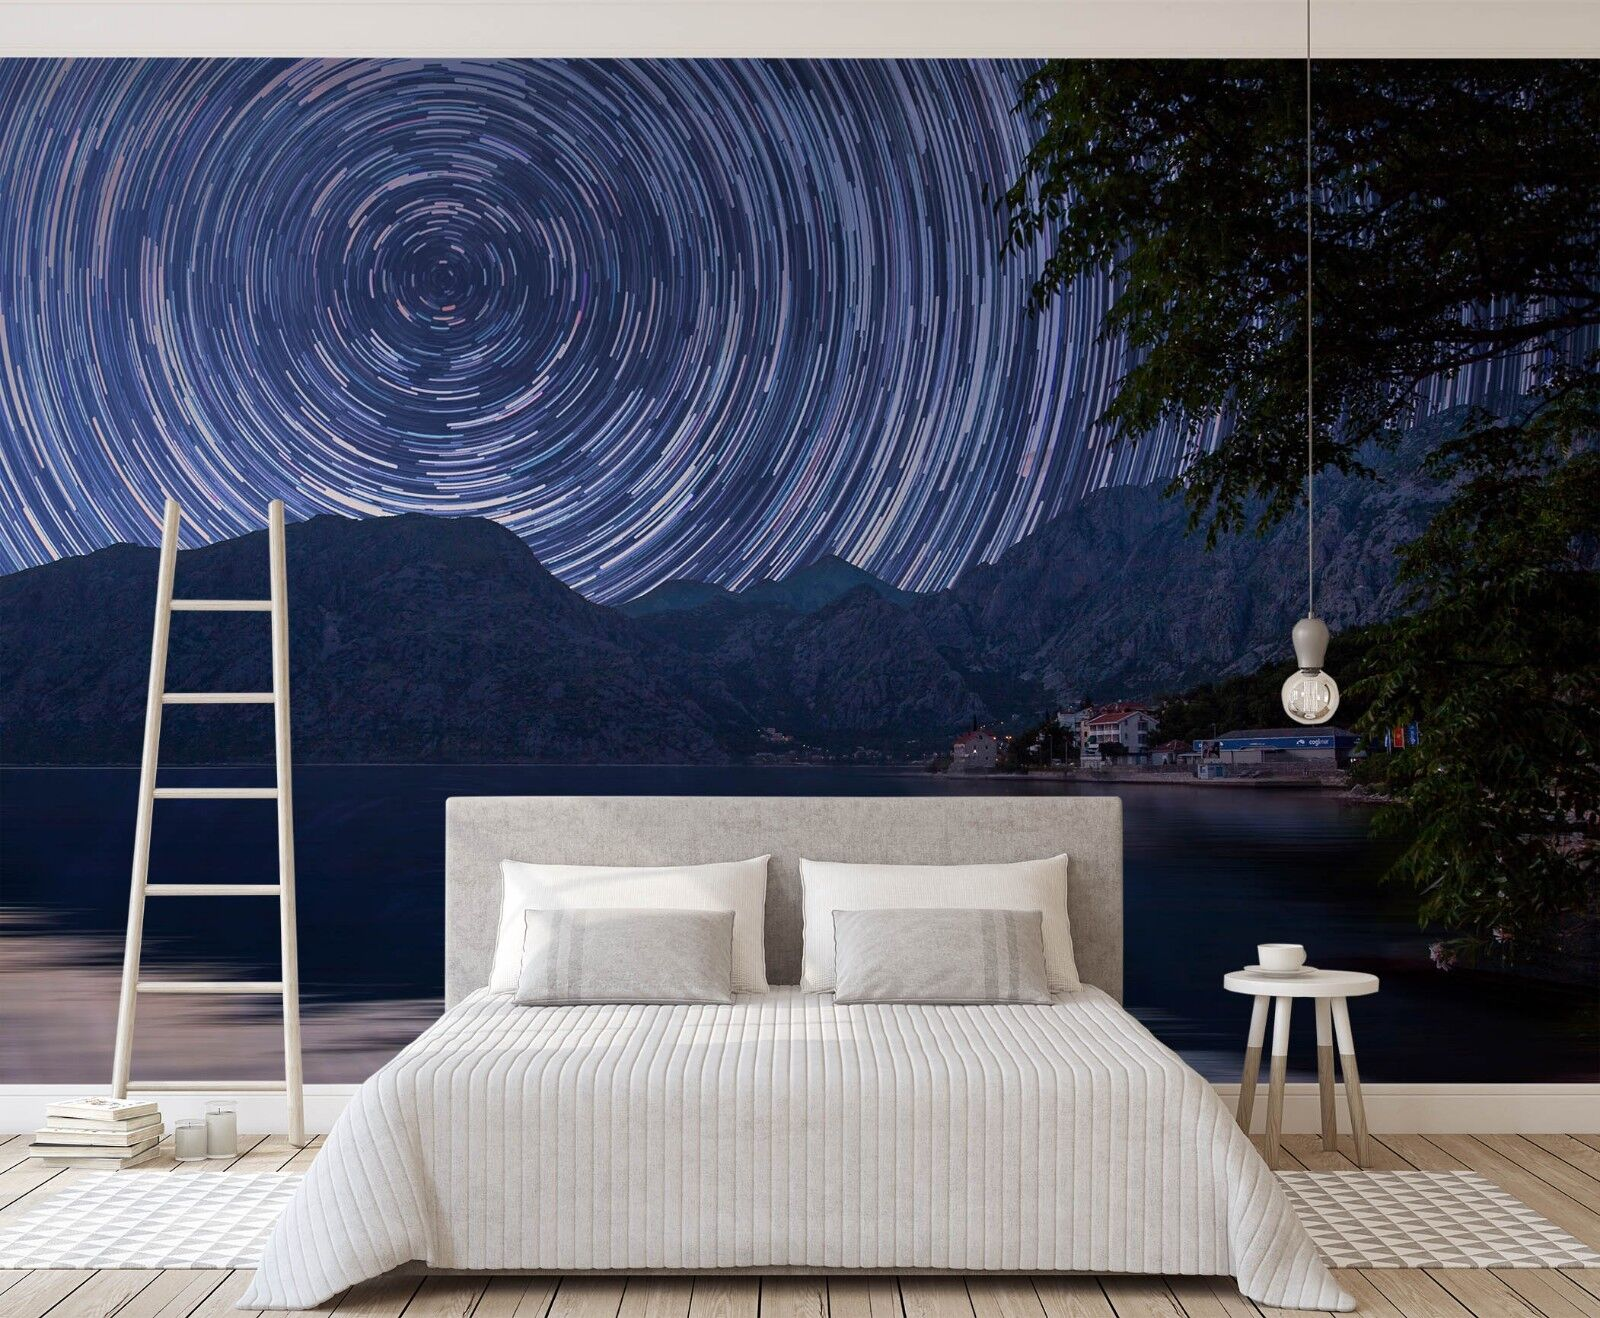 3D Swirl Blau 799 Wall Paper Print Wall Decal Deco Indoor Wall Murals US Summer